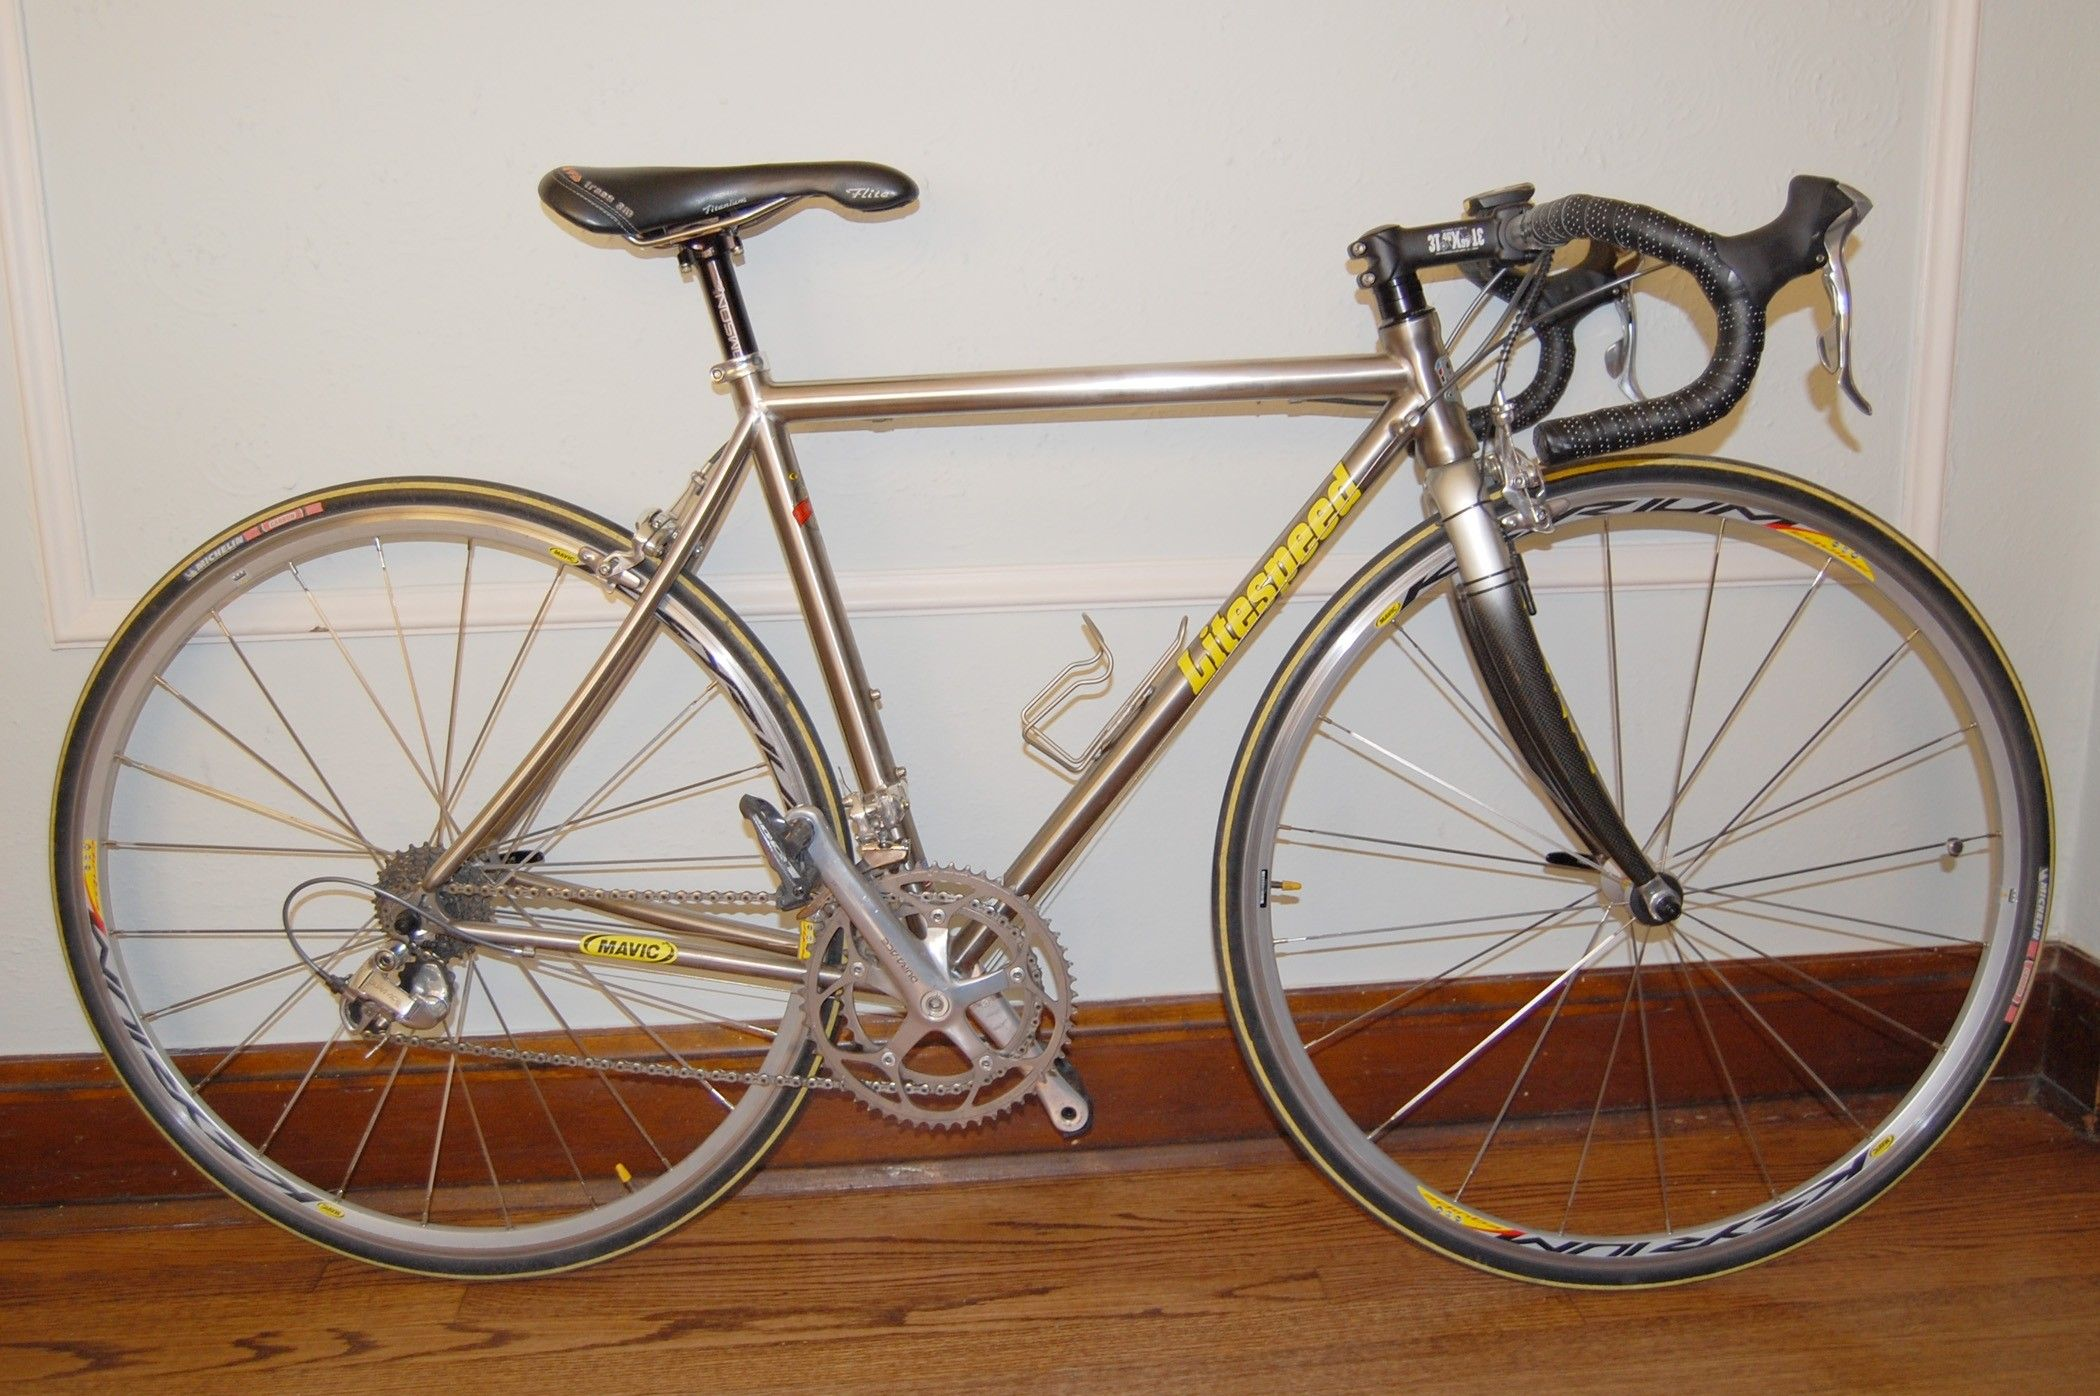 Litespeed Titanium Bike For Sale : Ash Cycles